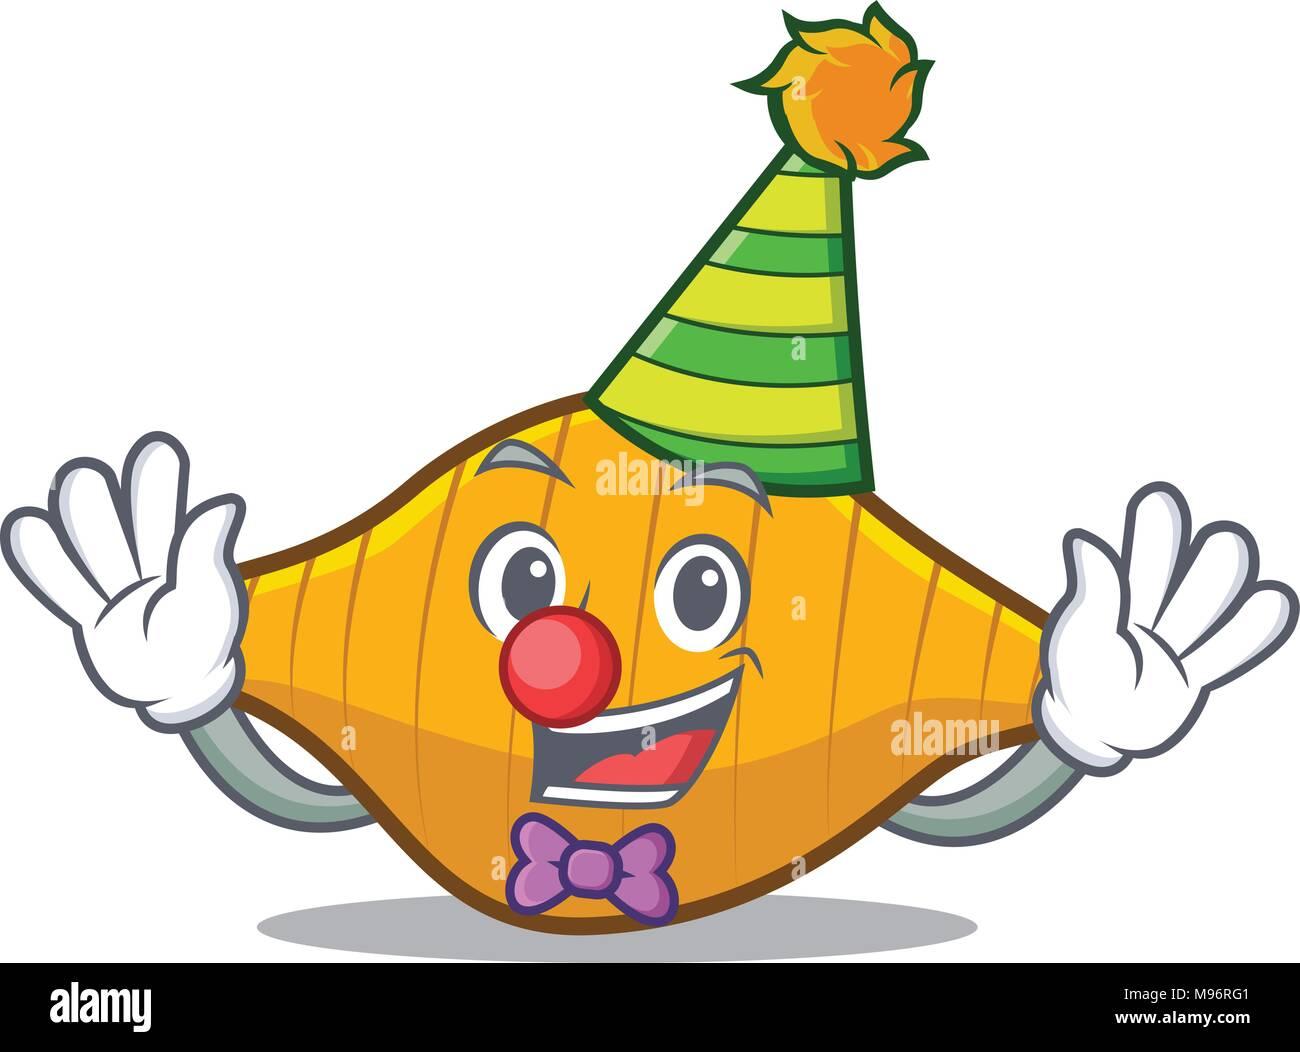 Clown conchiglie pasta mascot cartoon Stock Vector